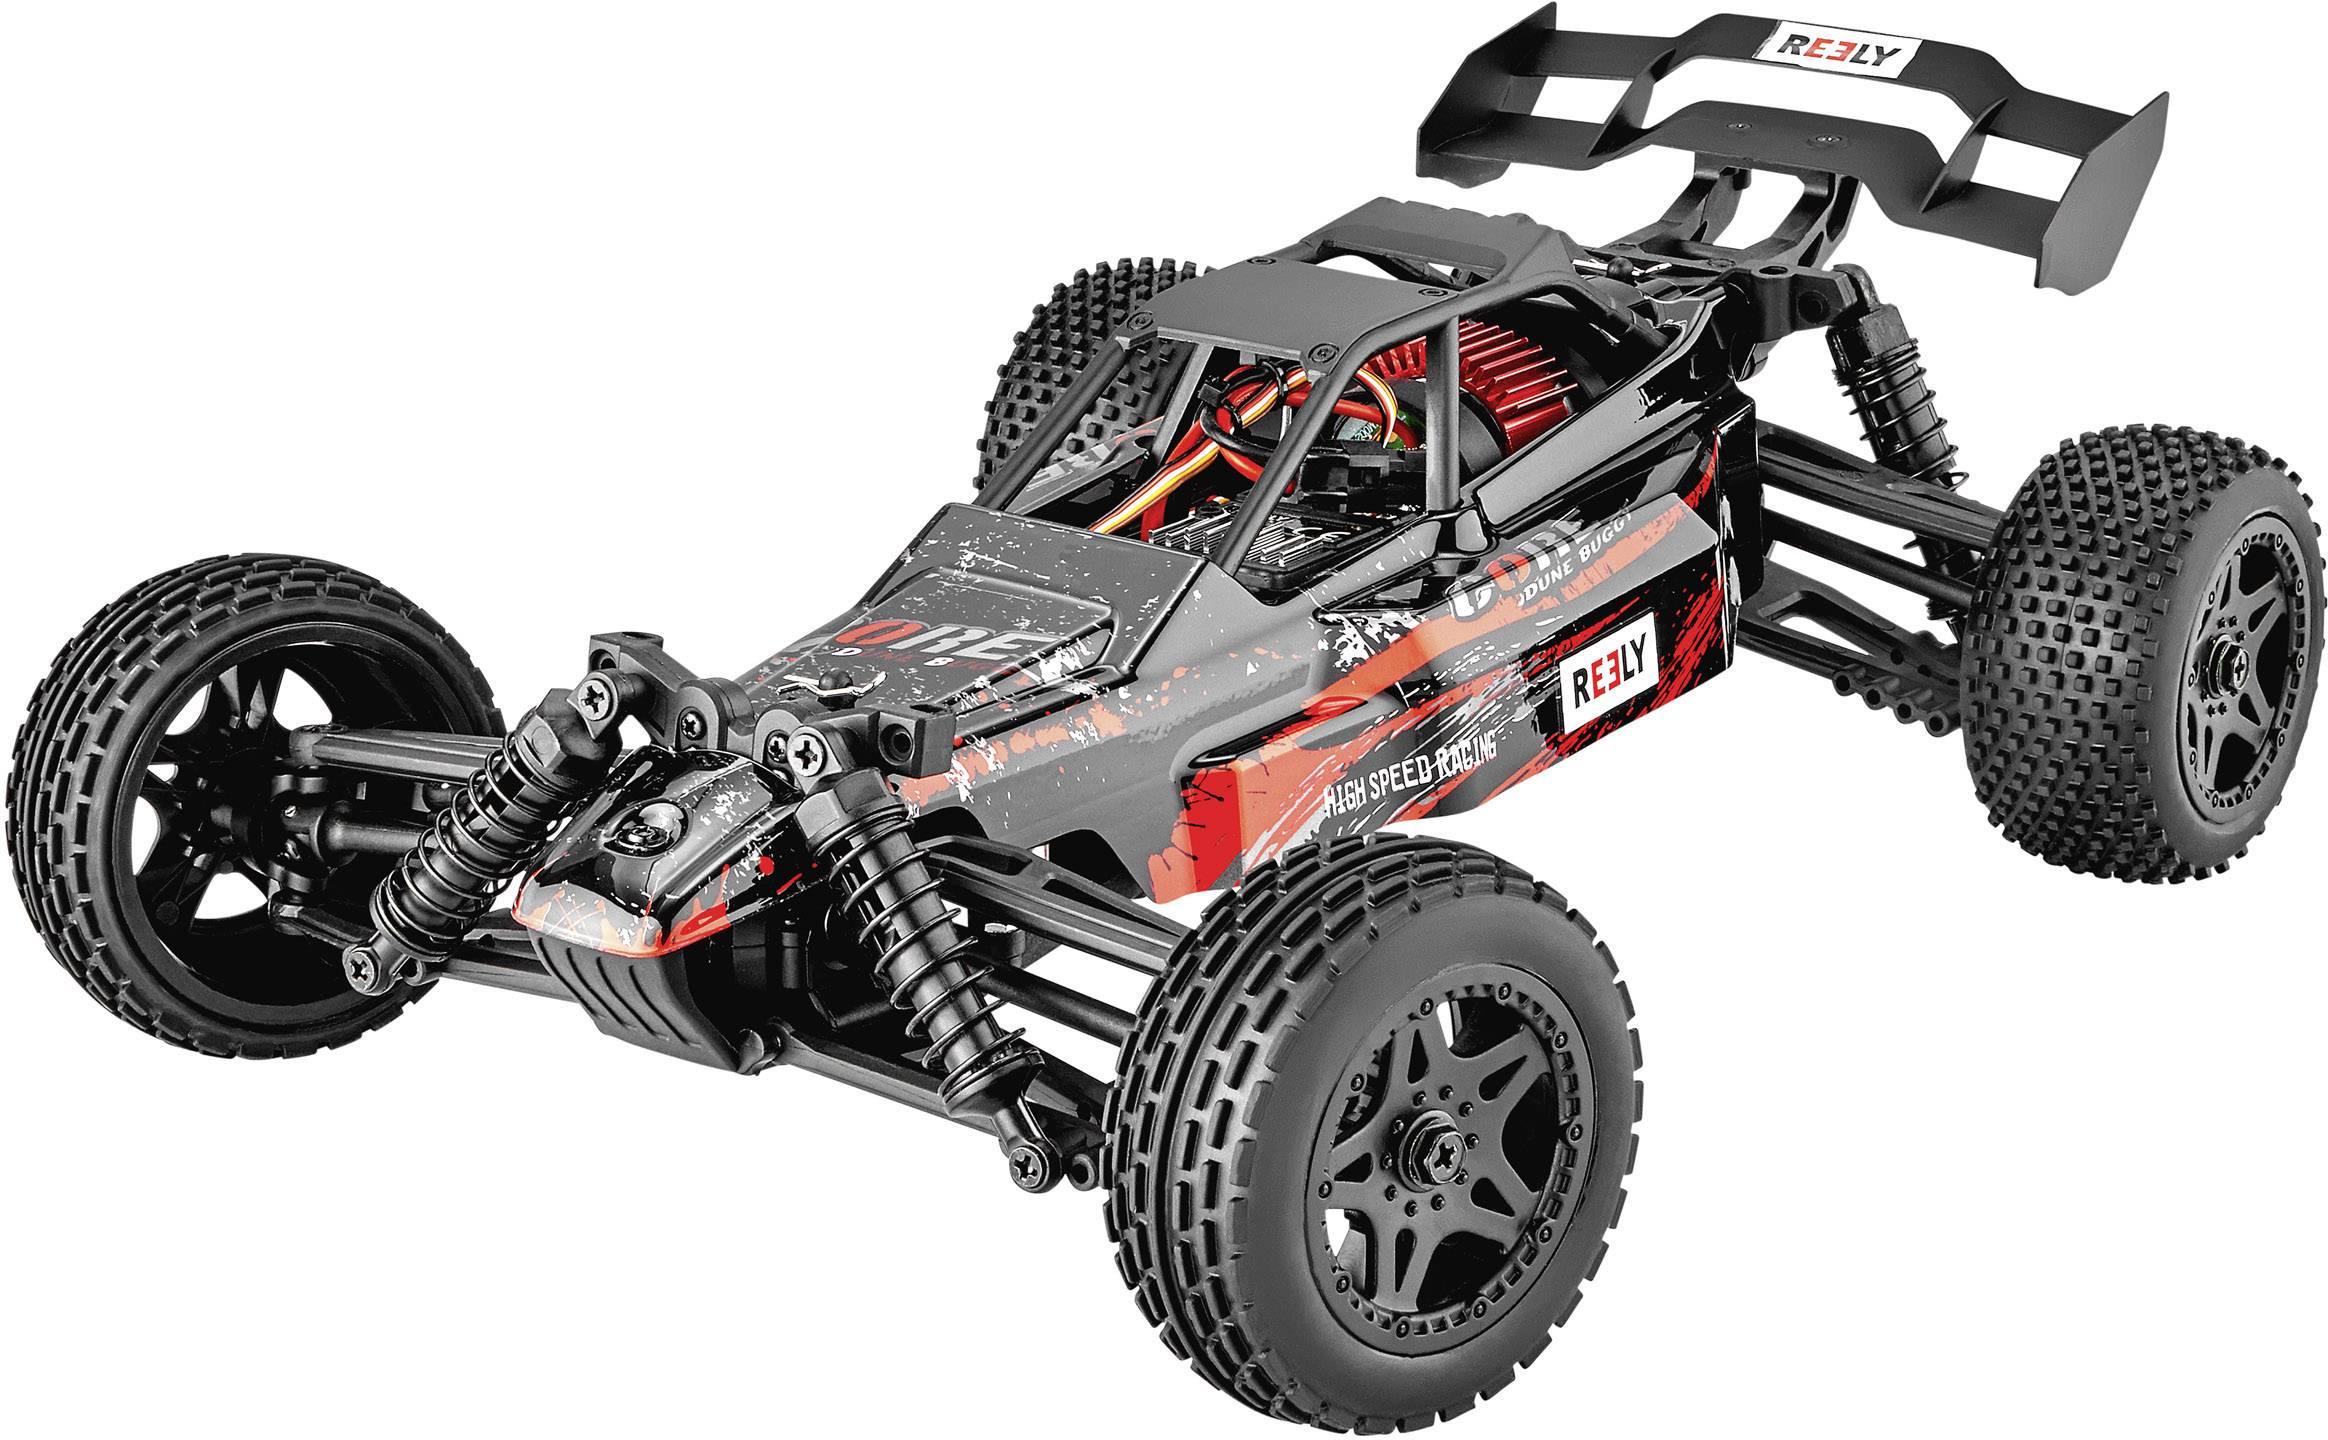 RC model auta buggy Reely Core, komutátorový, 1:10 XS, 4WD (4x4), RtR, 20 km/h